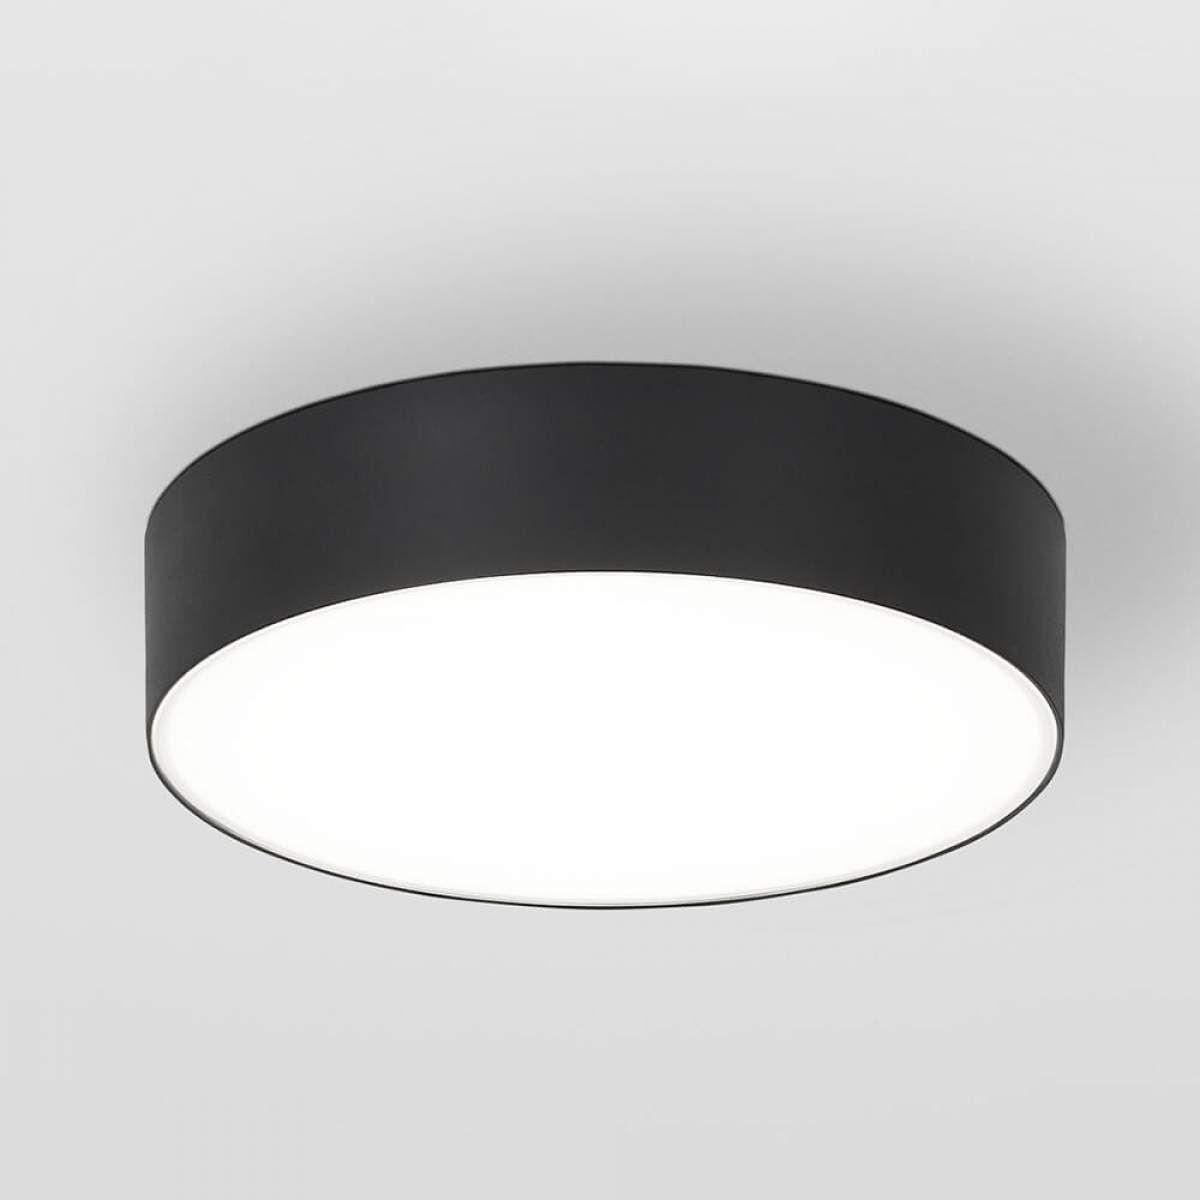 deckenlampe led flach best flache deckenlampe schn holz luxe van led frisch led lampe ideen. Black Bedroom Furniture Sets. Home Design Ideas